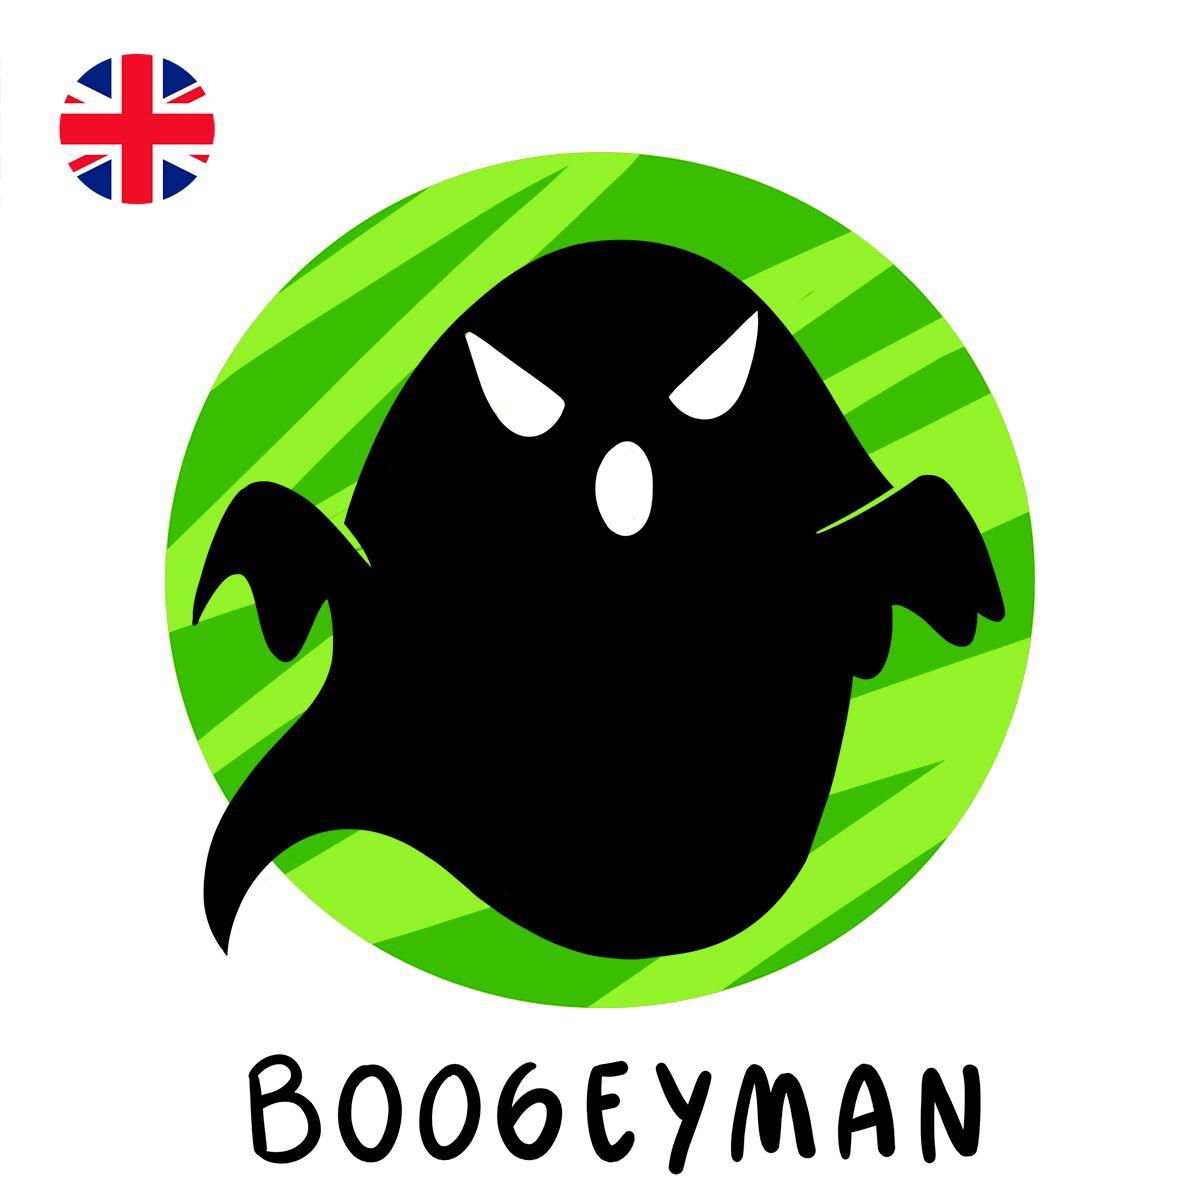 bicho-papão boogeyman